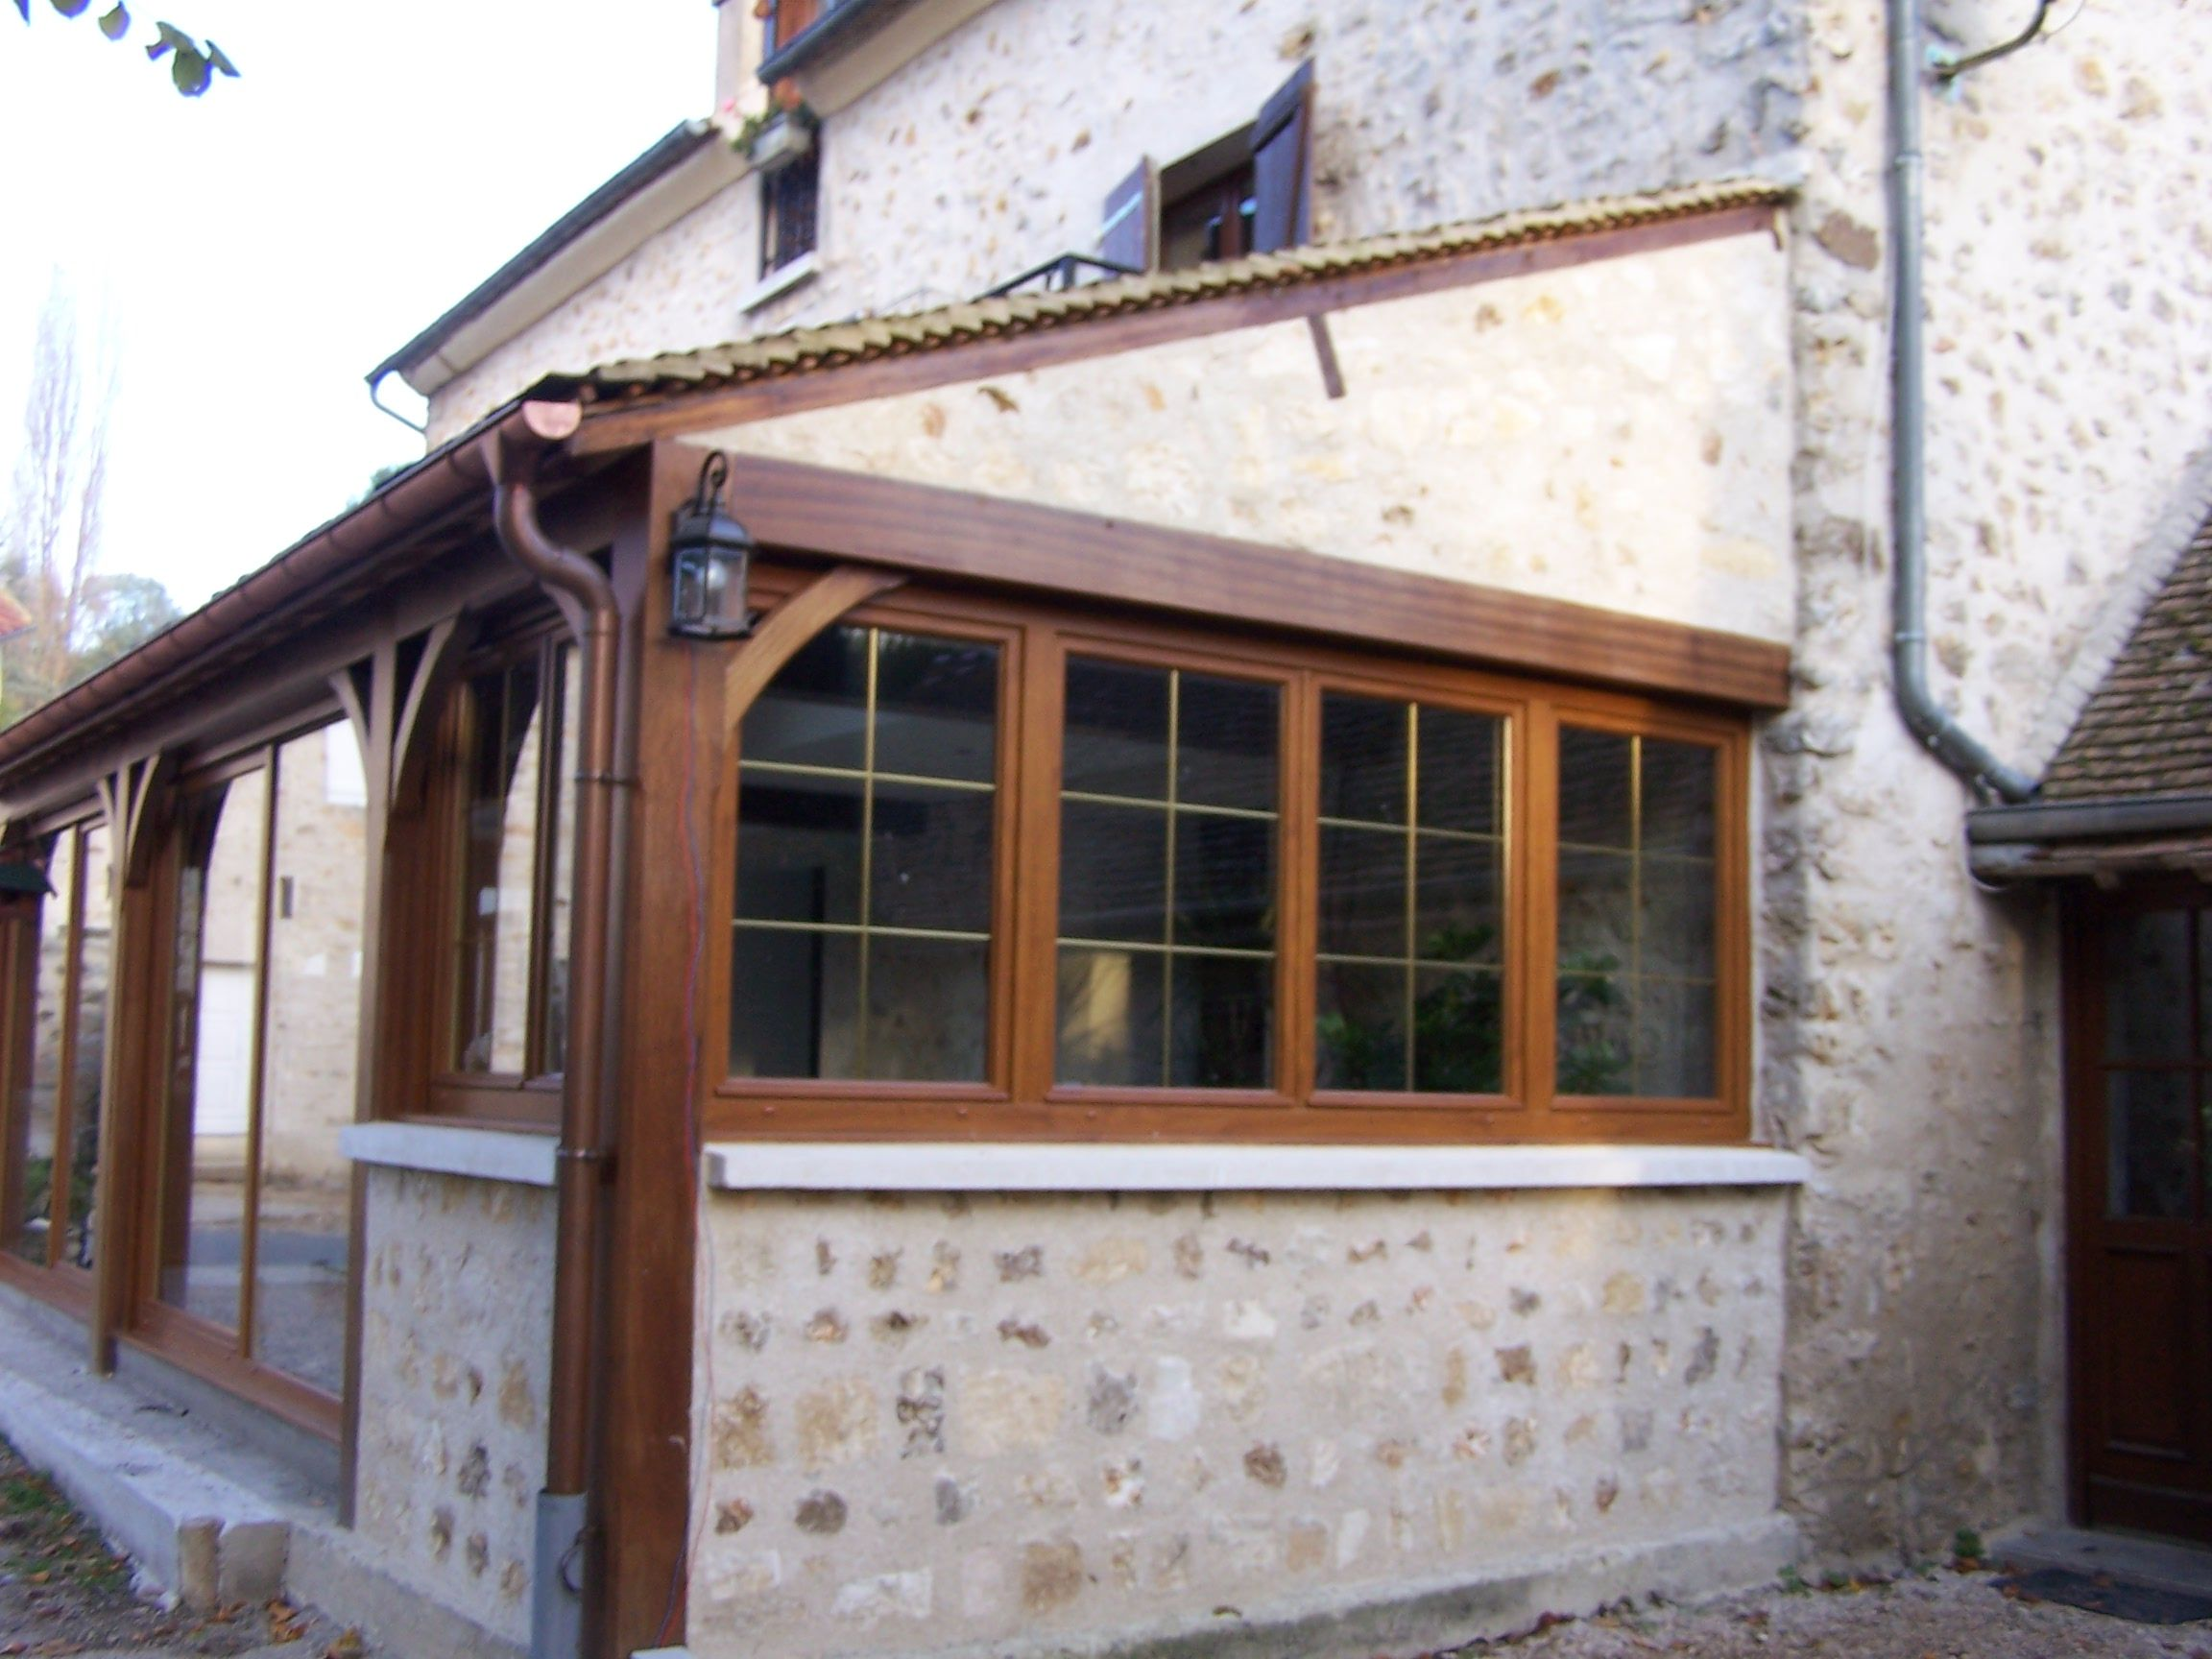 Afficher l 39 image d 39 origine v randas veranda - Maison modulaire espagnole ...